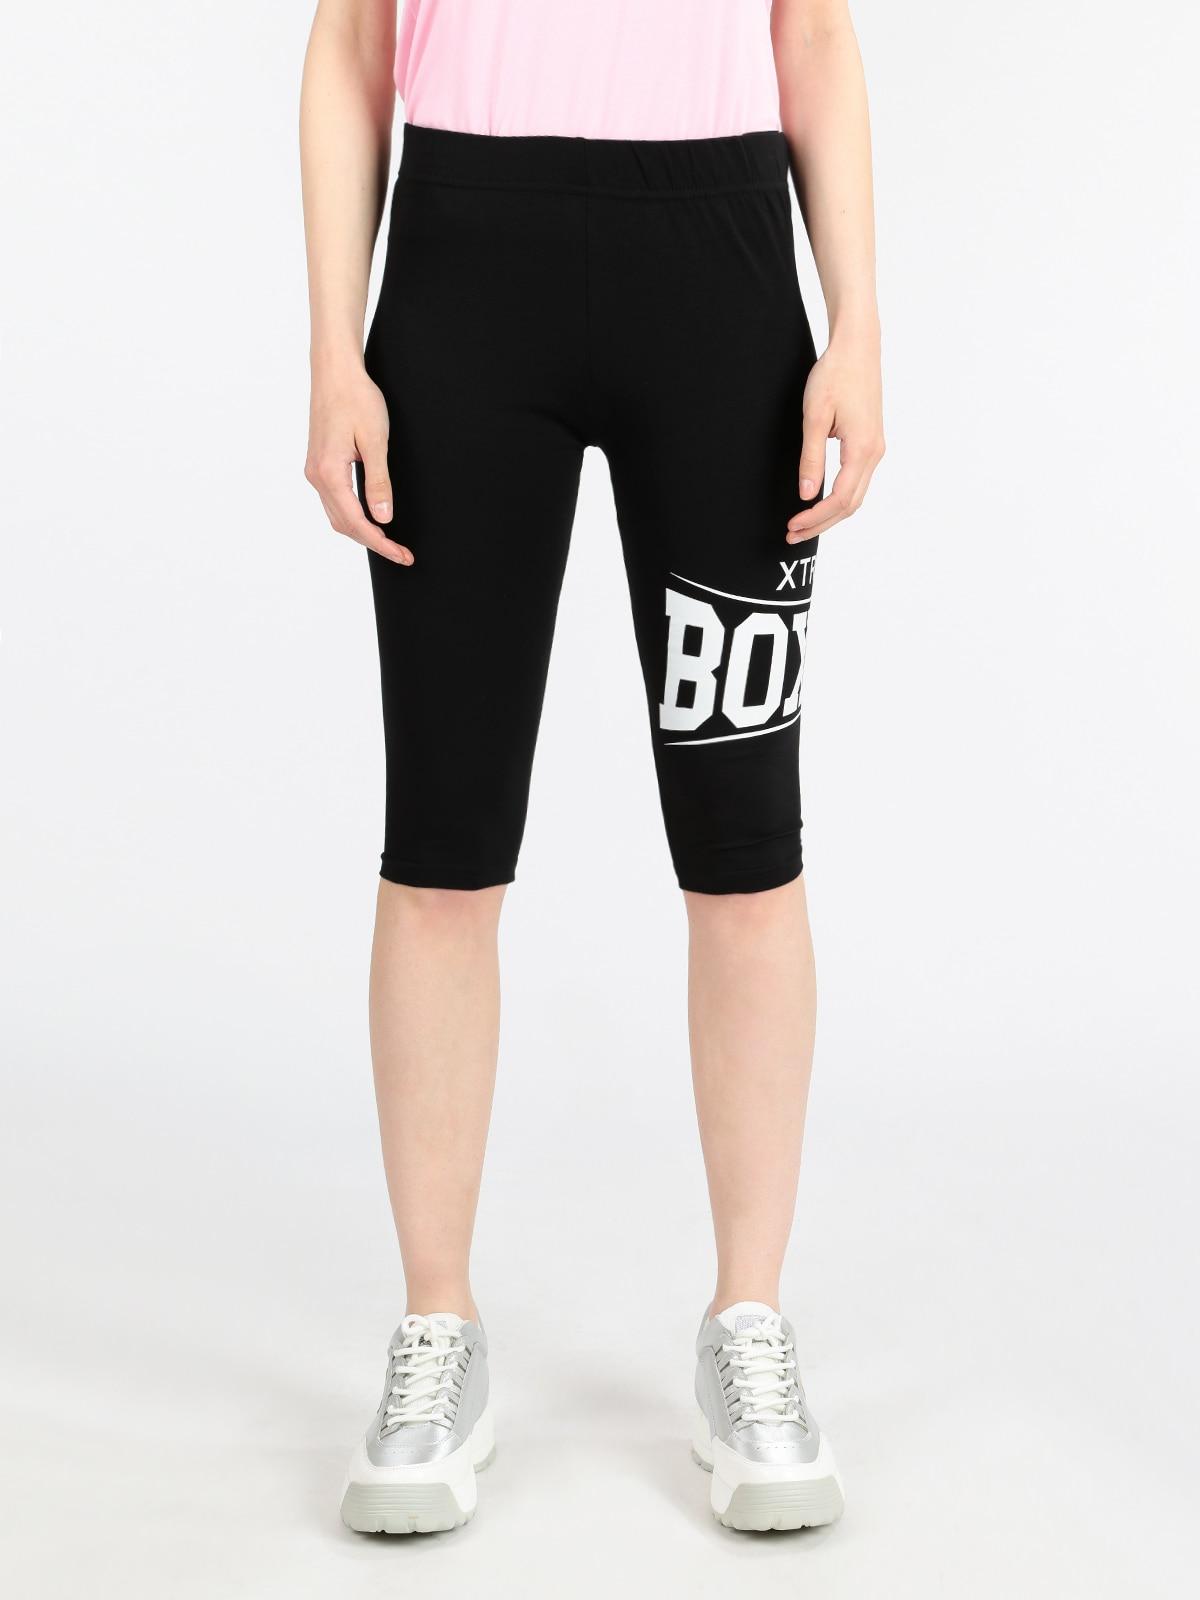 Leggings Black Cycling Shorts